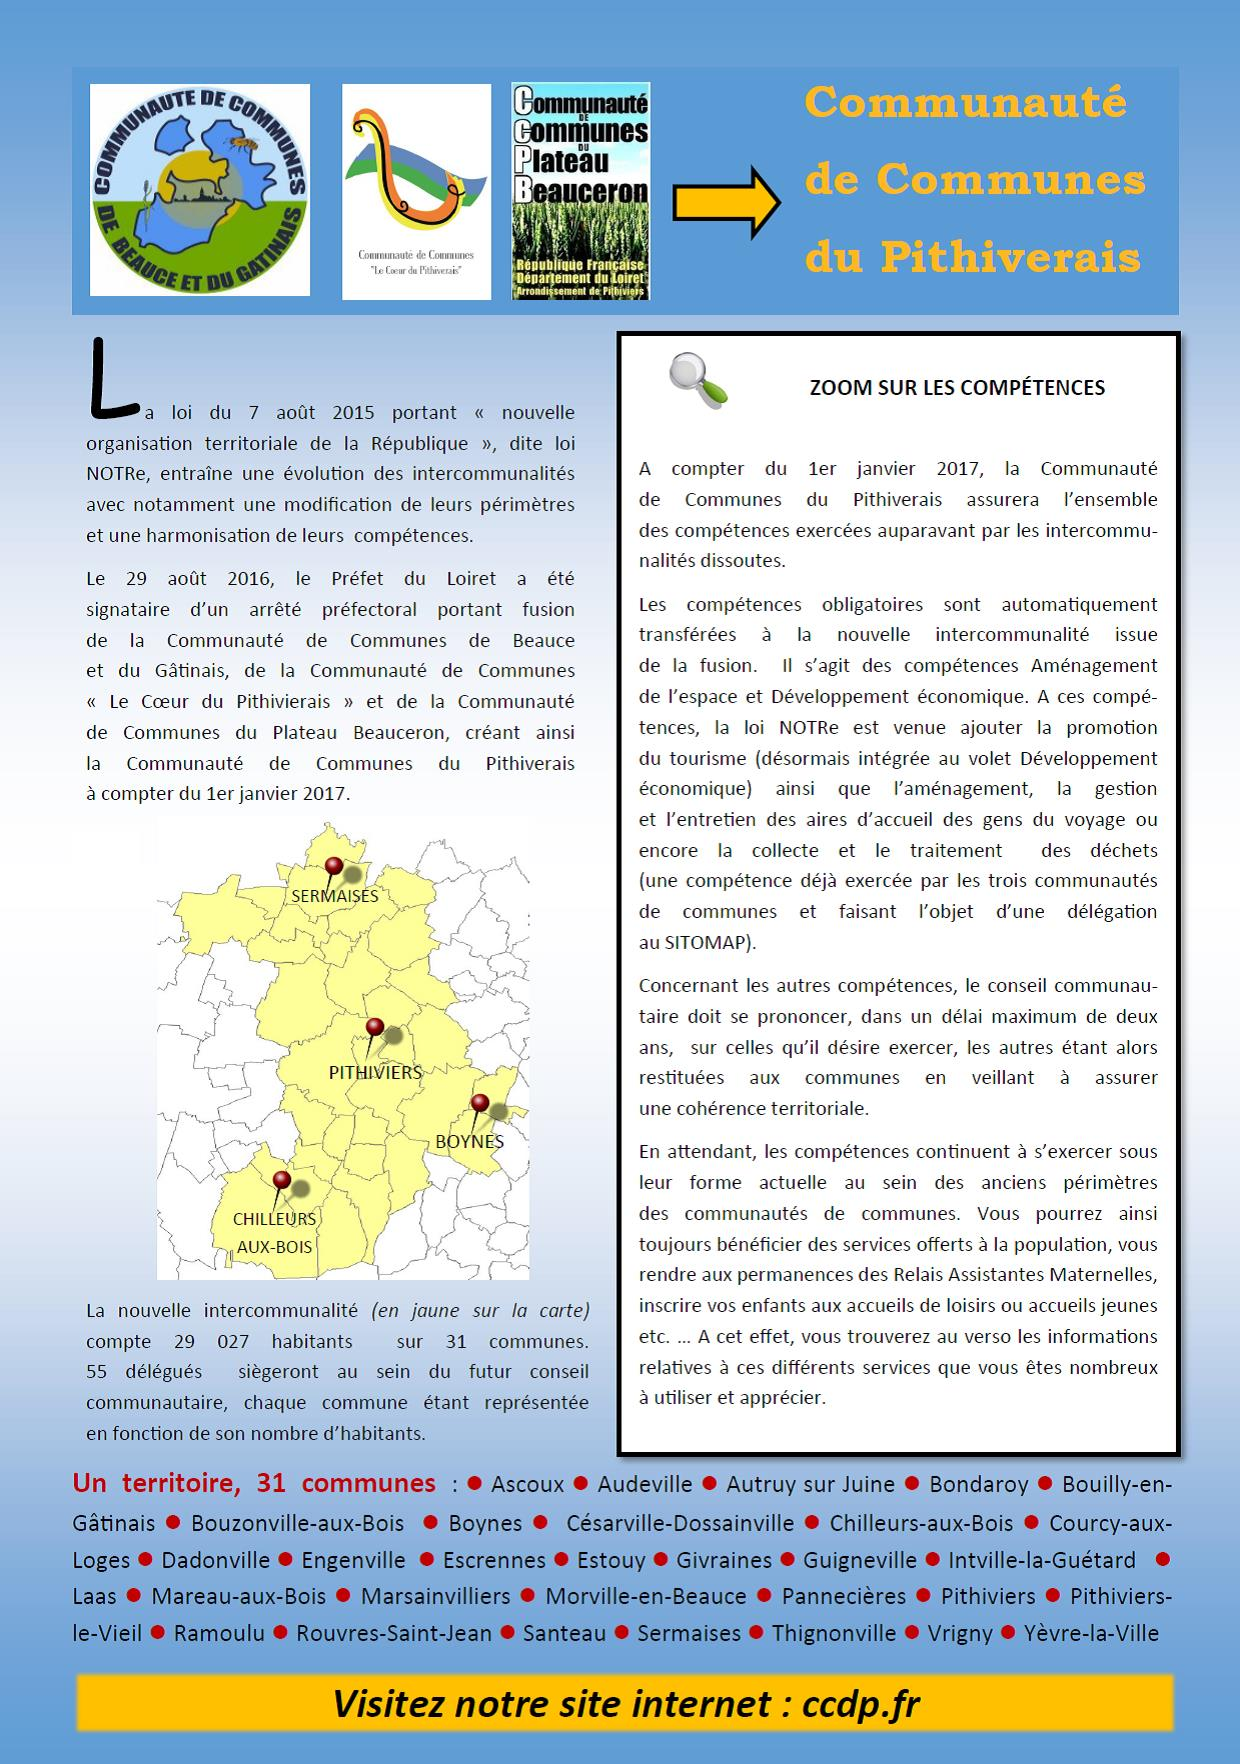 1-letre-info-ccdp